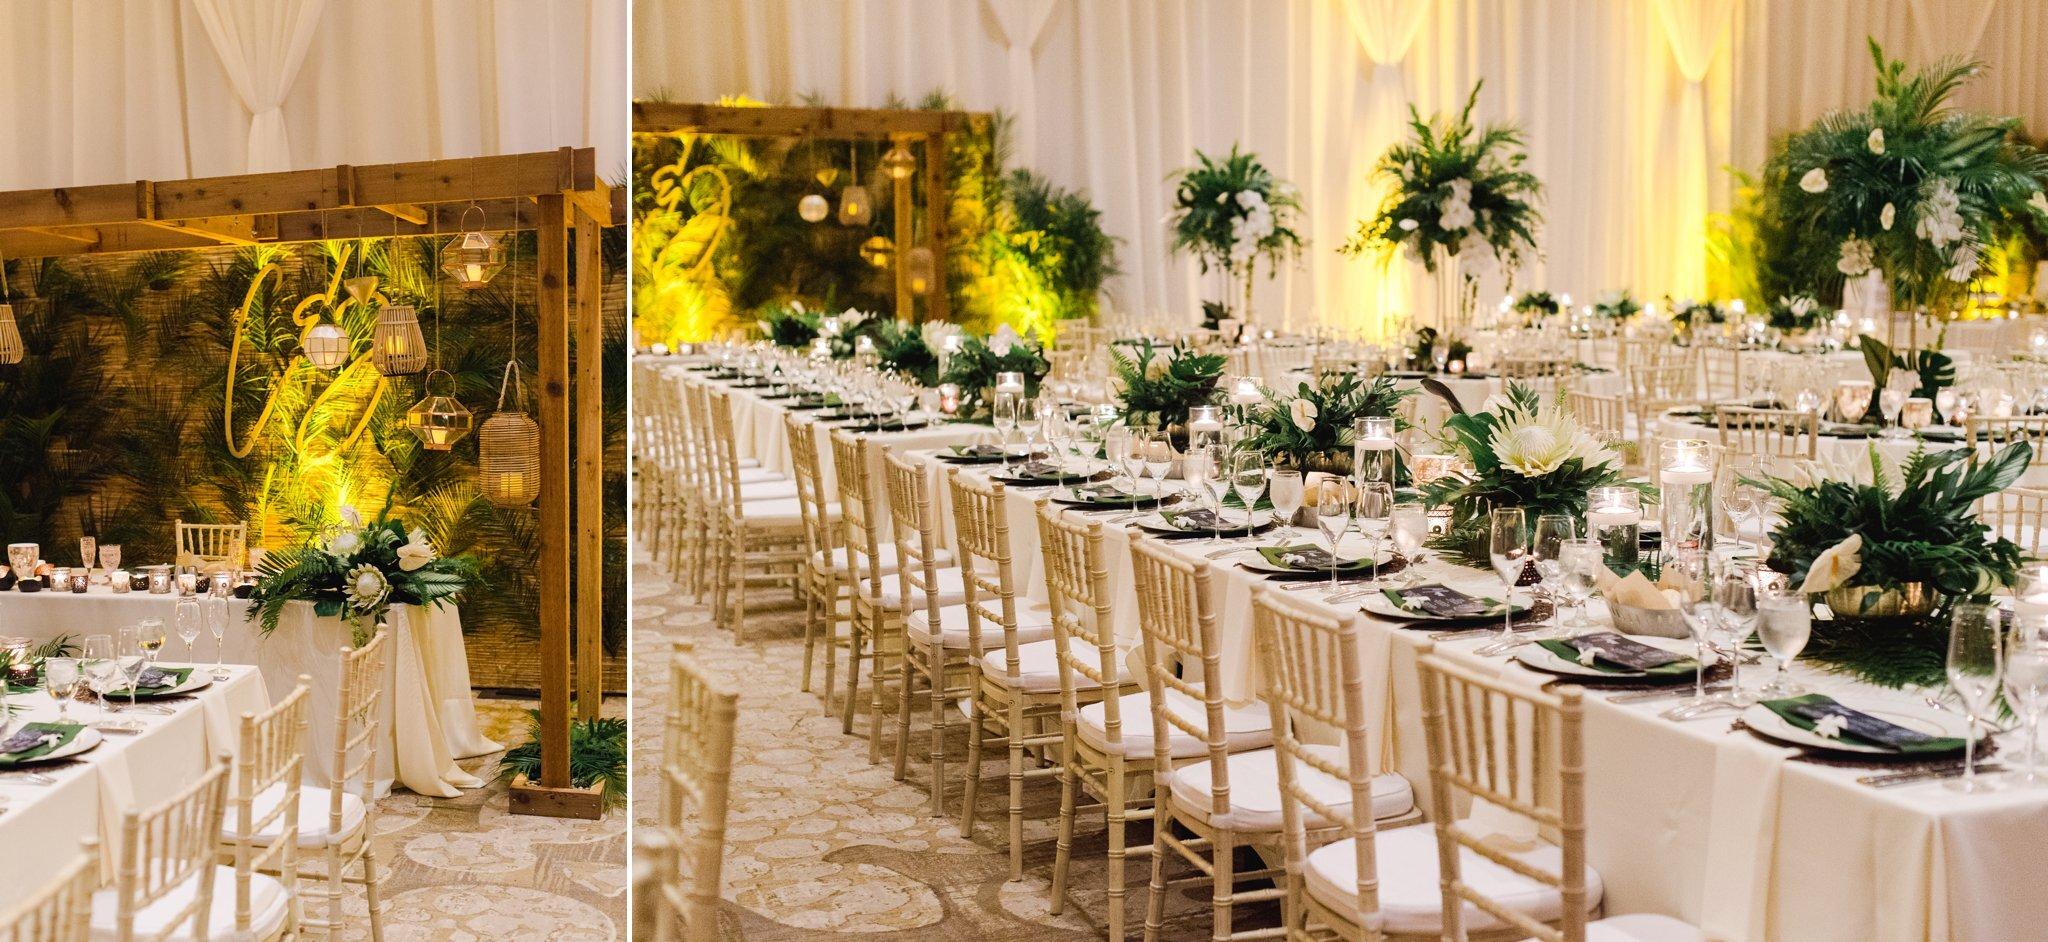 jw marriott marco island wedding photographer marco island wedding photographer shannon griffin photography_0151.jpg